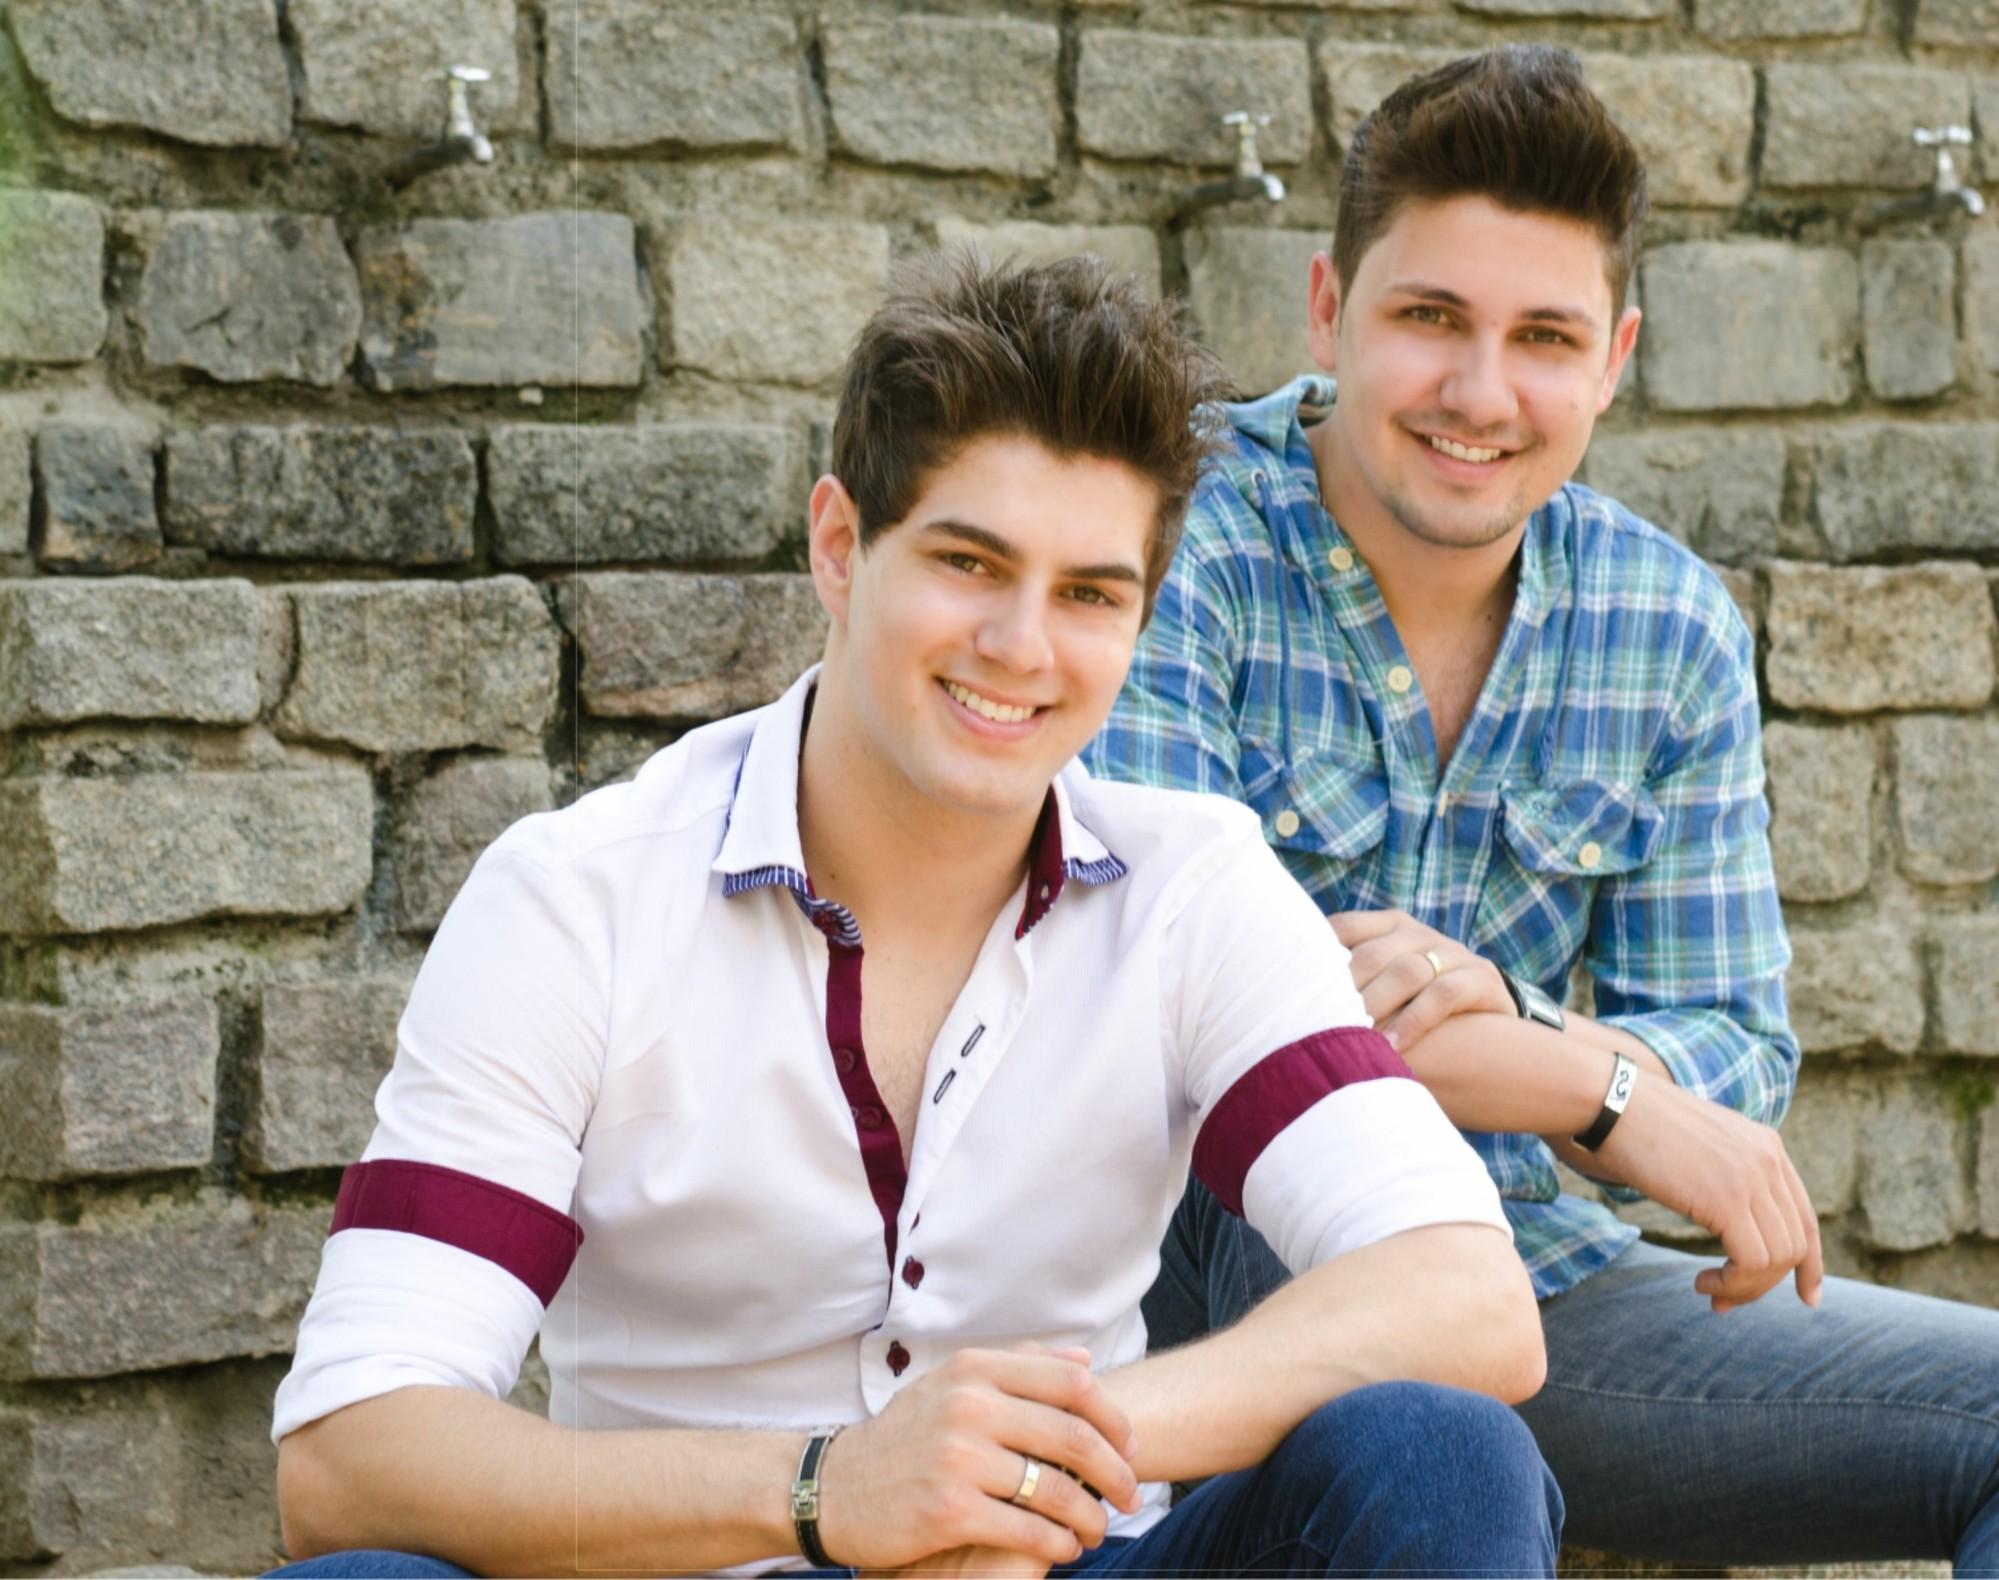 Fernando e Fabiano e Talis & Welinton